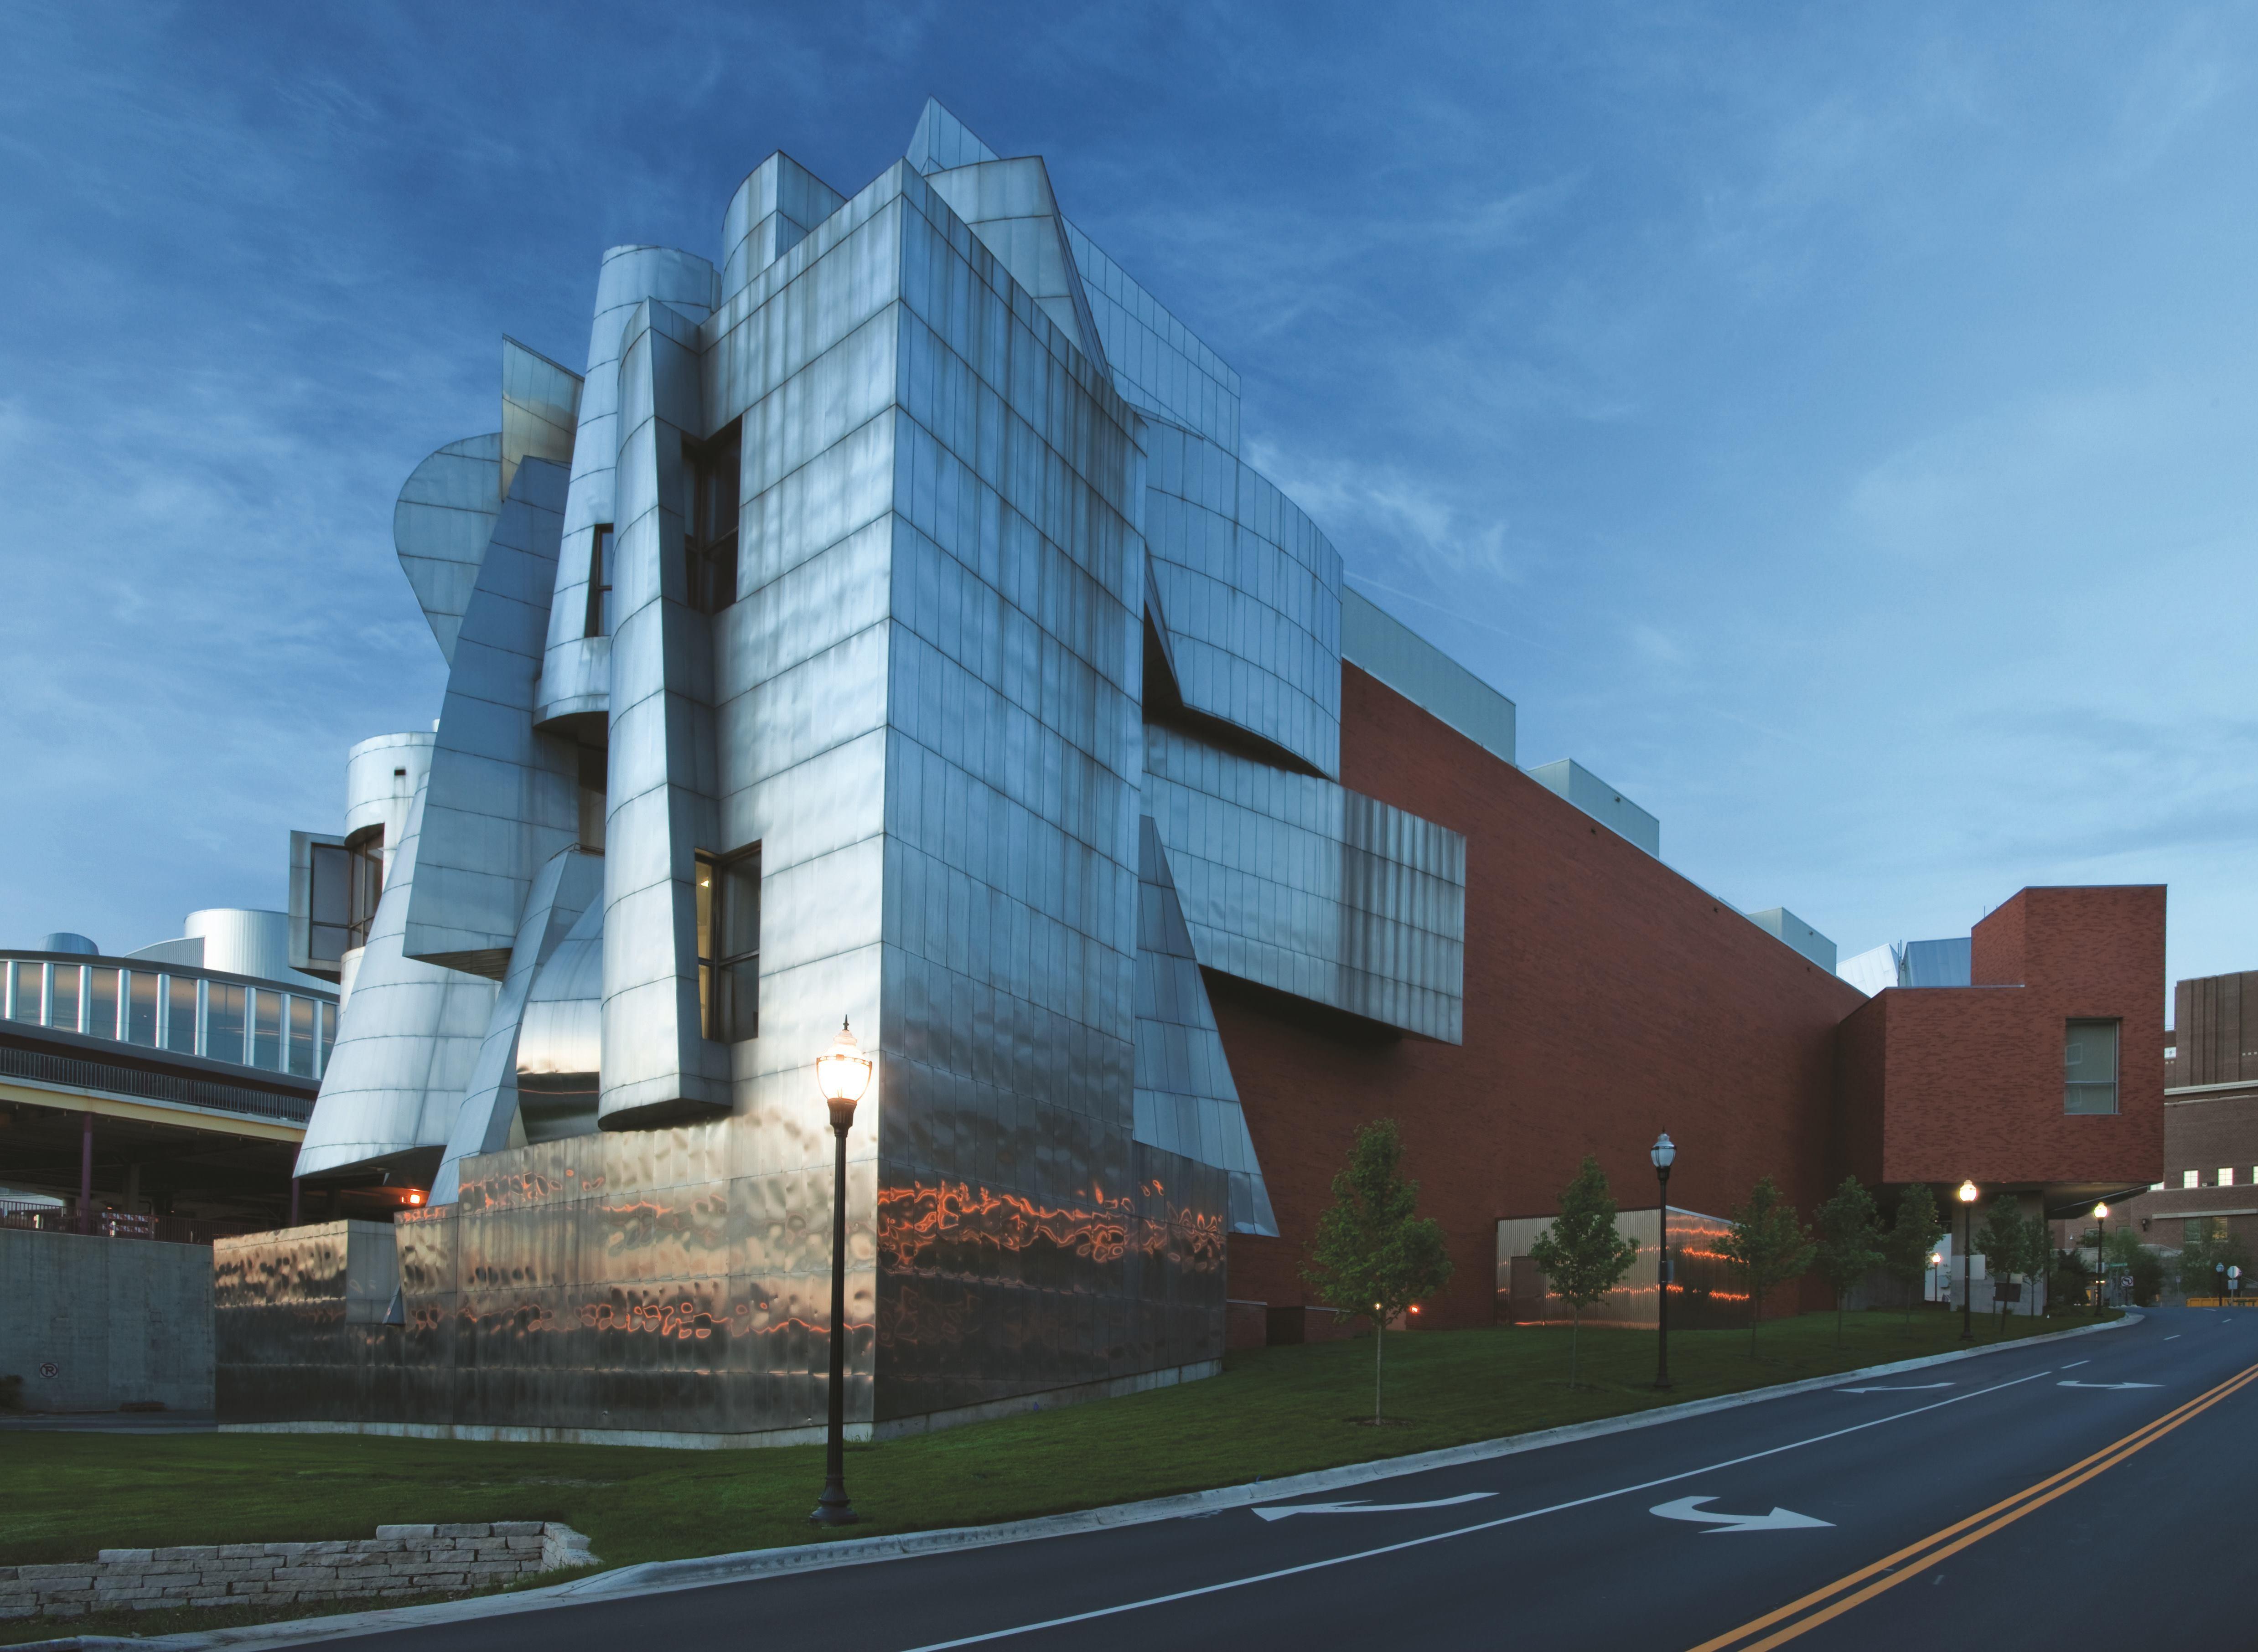 Weisman Art Museum Residential Architect Frank Gehry